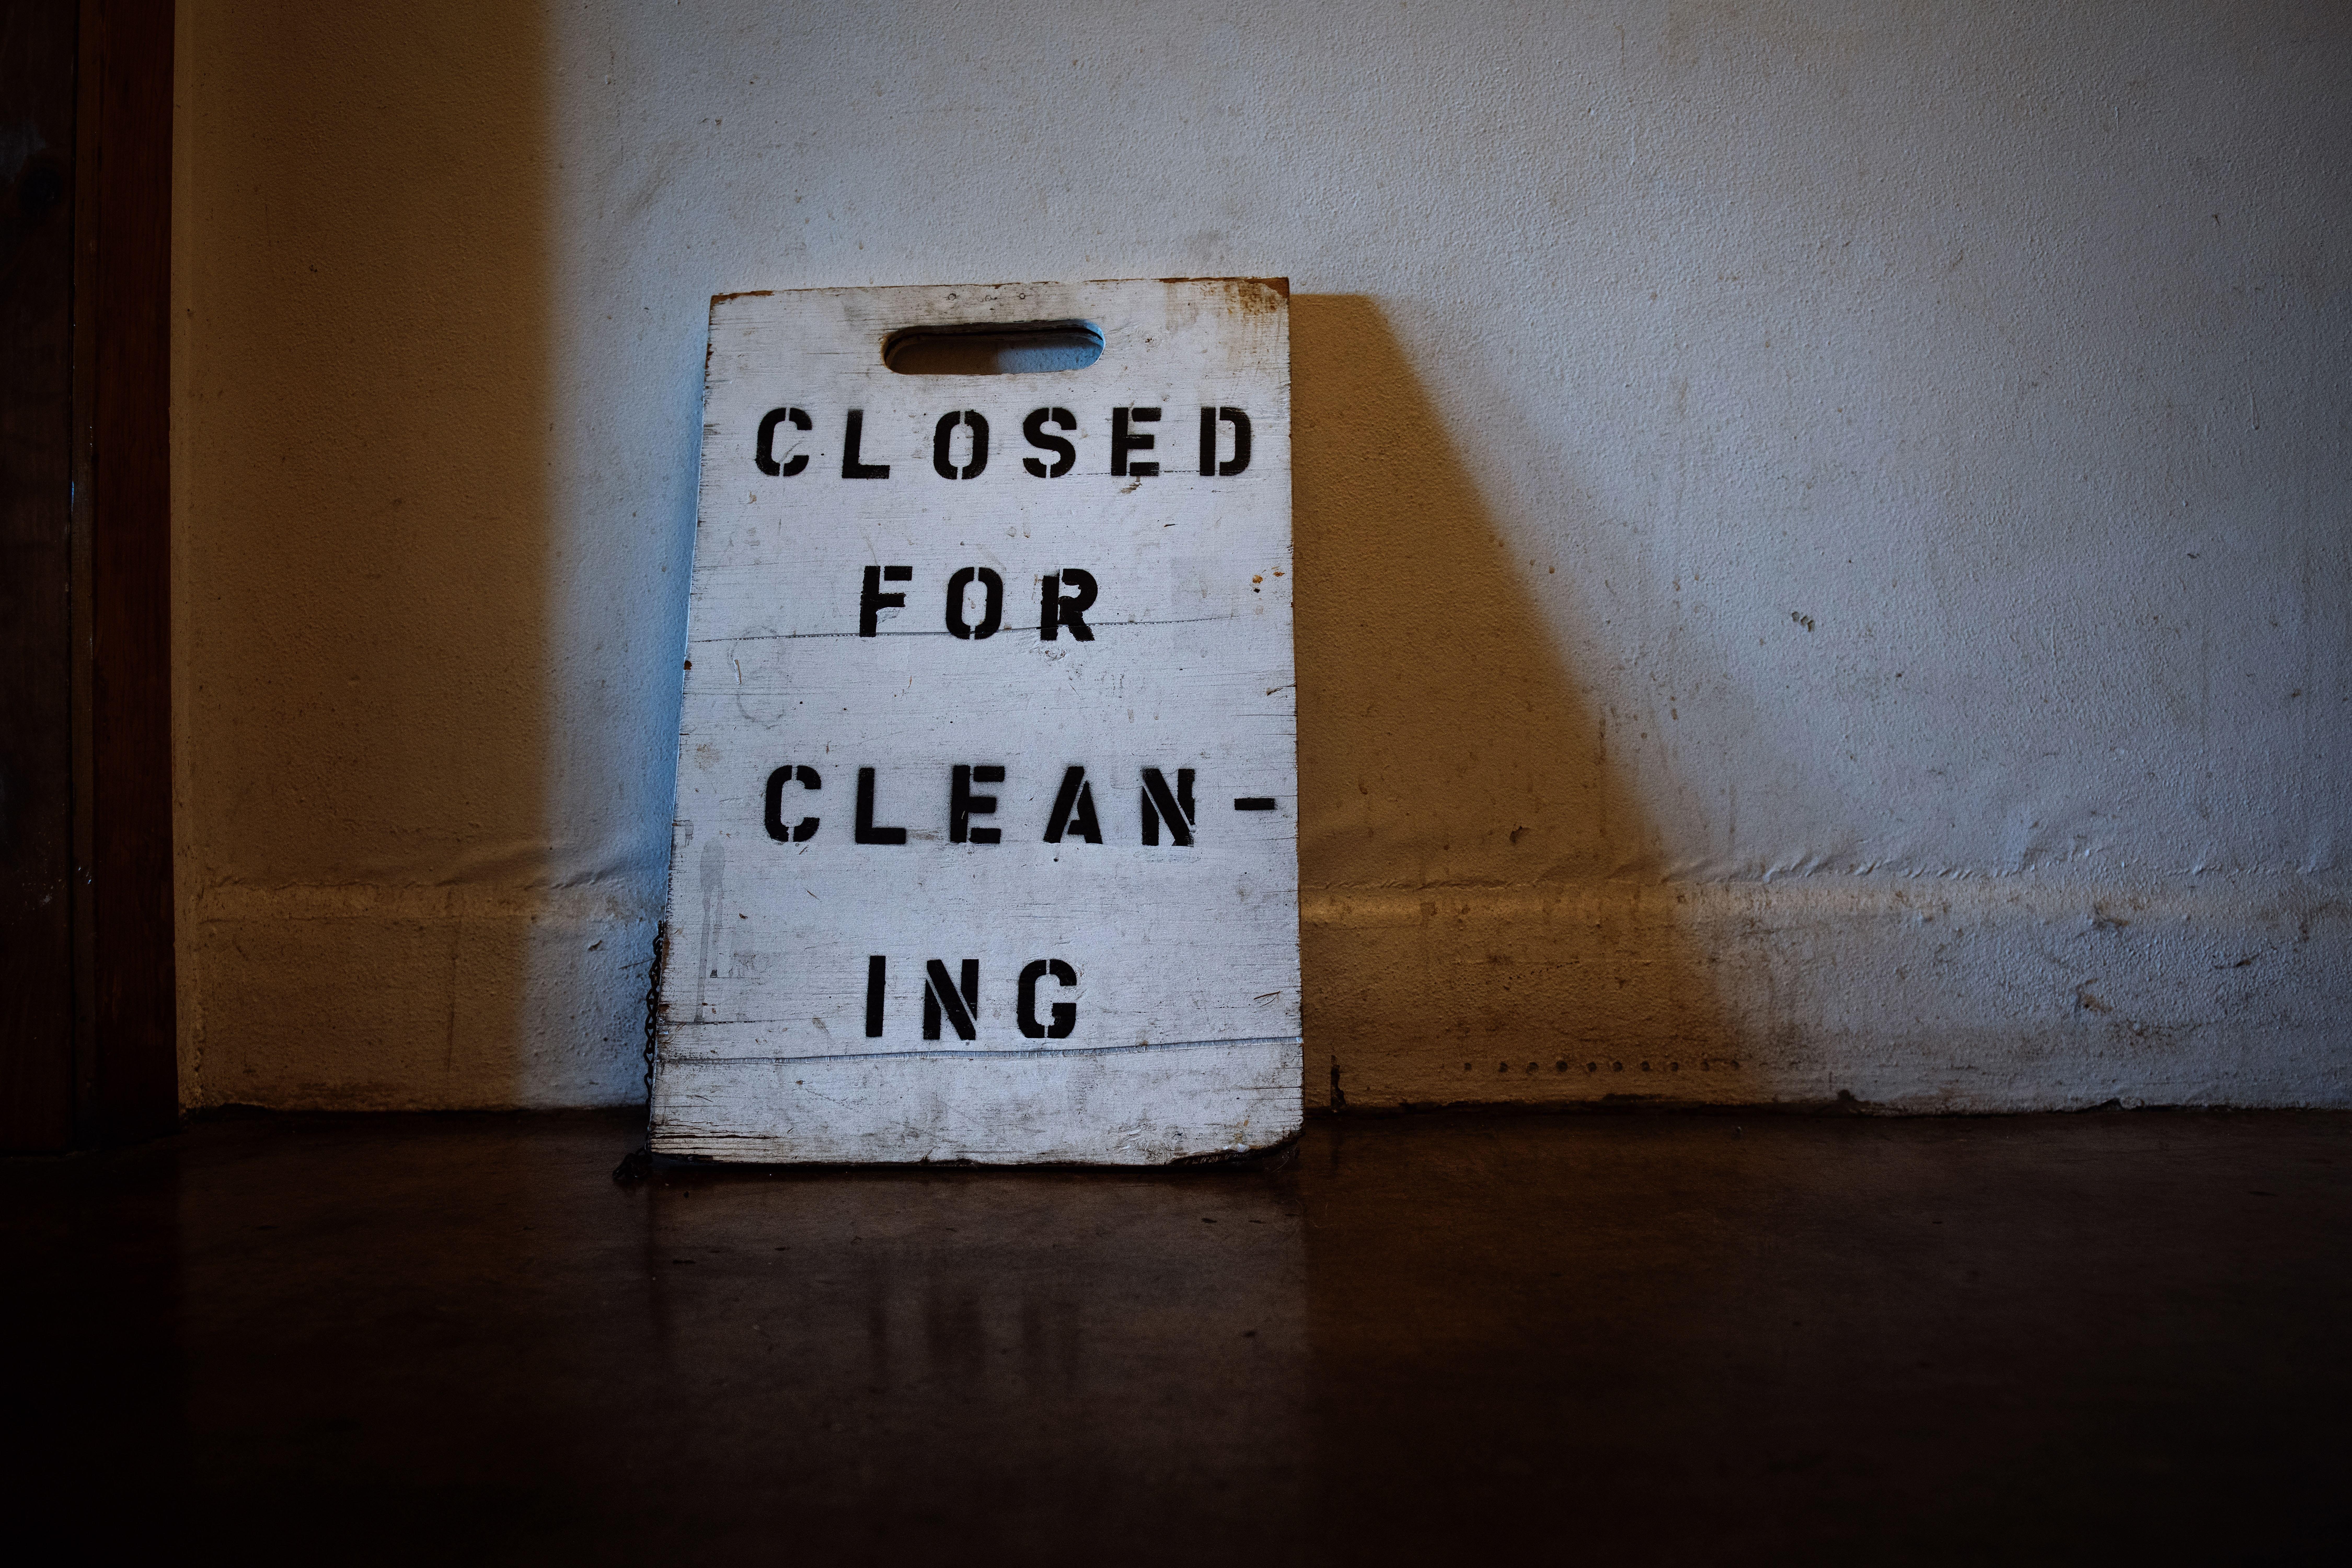 Closed October 29th